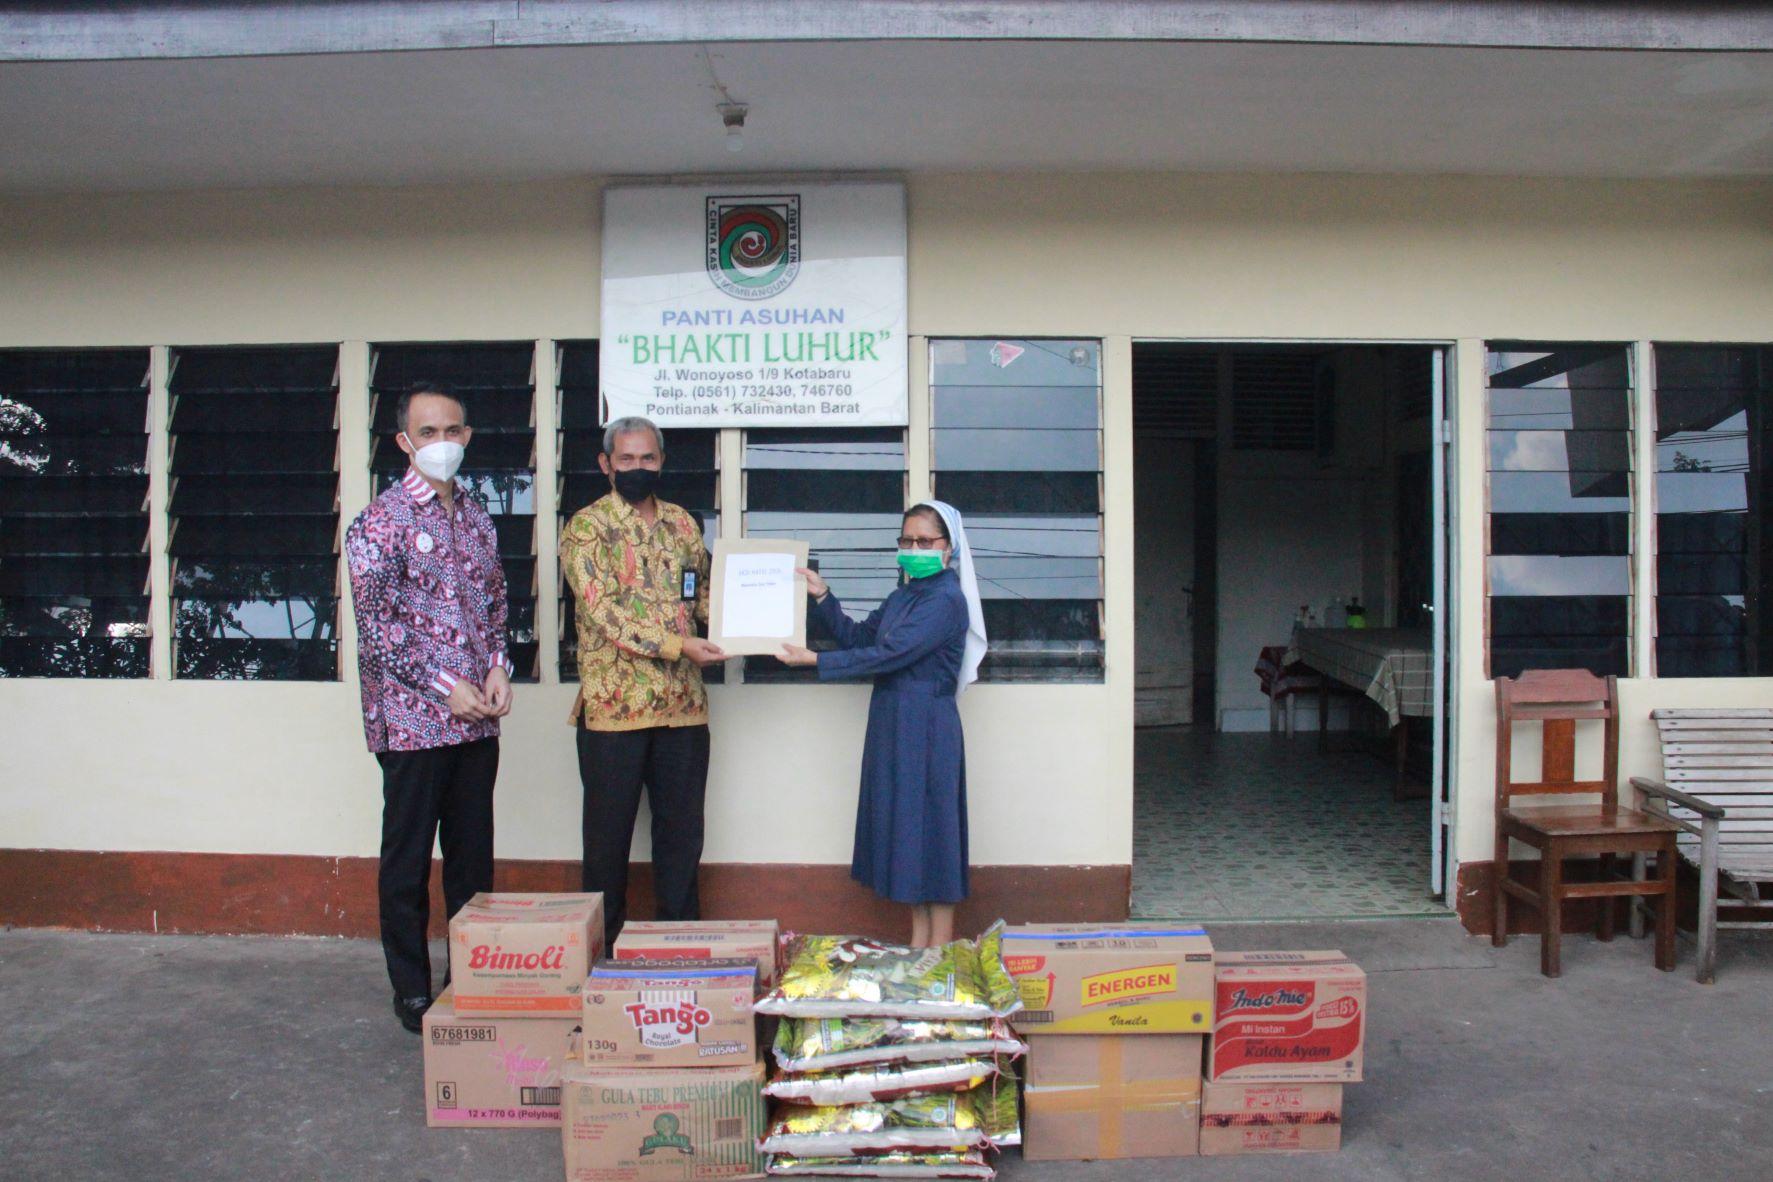 Bakti Sosial Kementerian Keuangan Perwakilan Kalimantan Barat Wujud Bela Rasa kepada Sesama